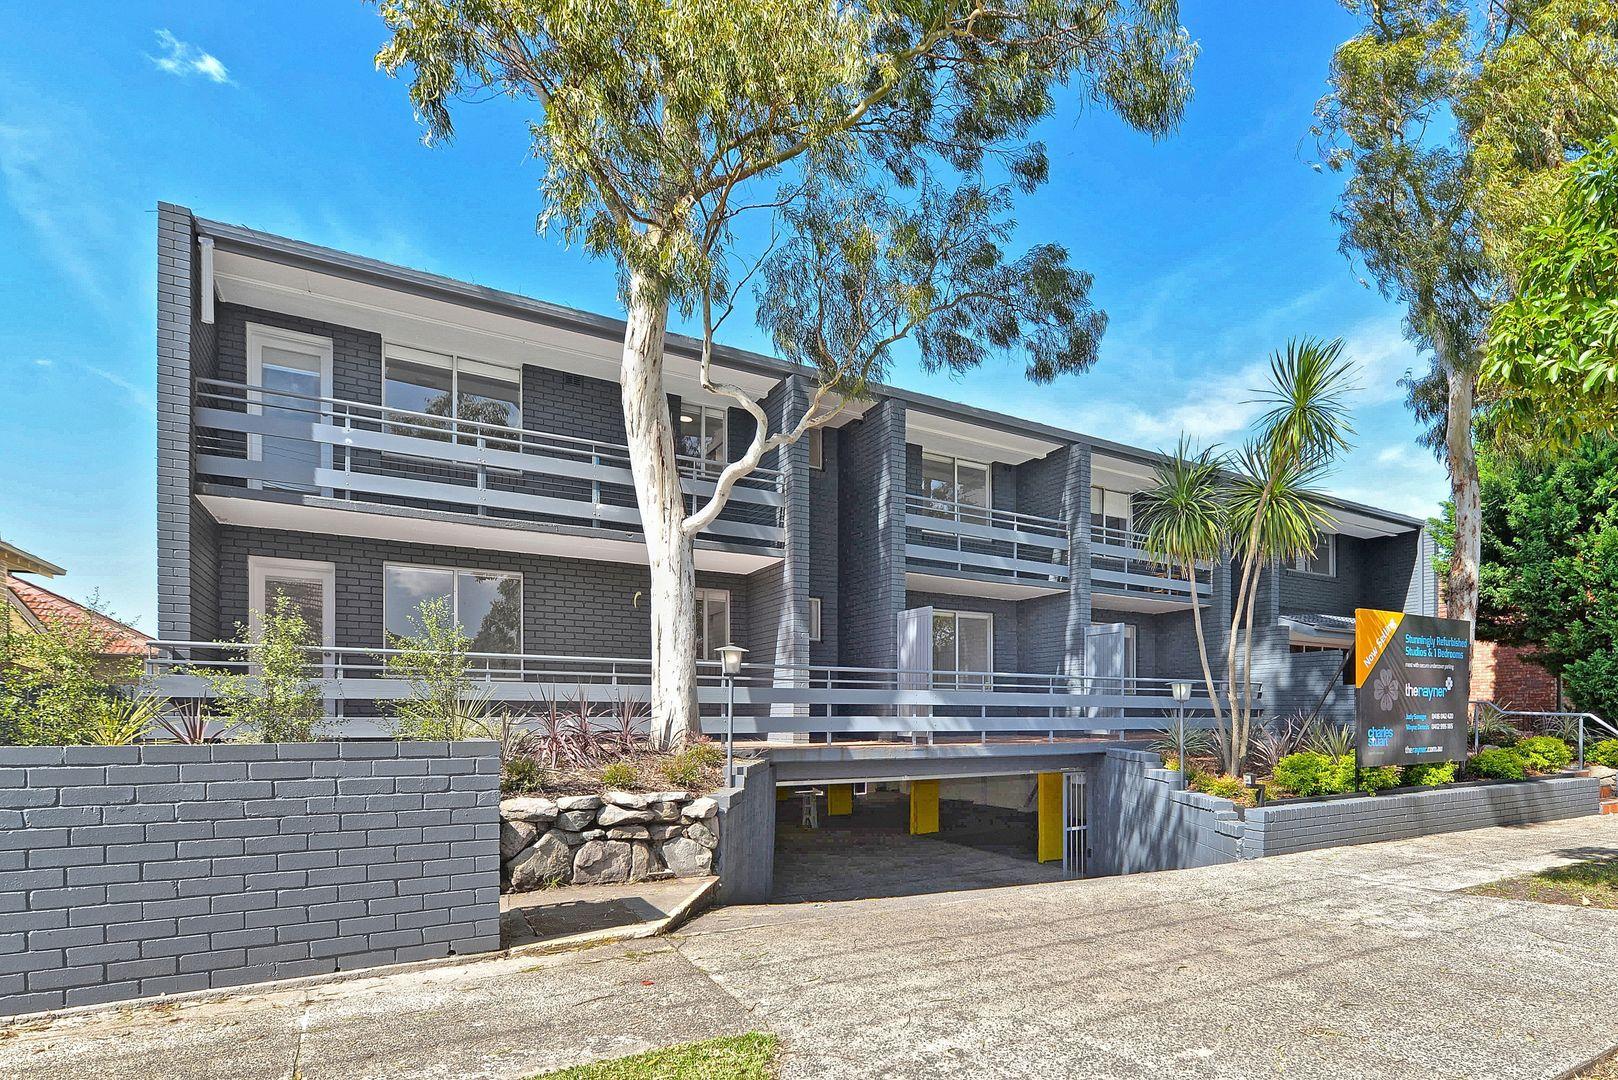 7/3 Rayner Street, Lilyfield NSW 2040, Image 0